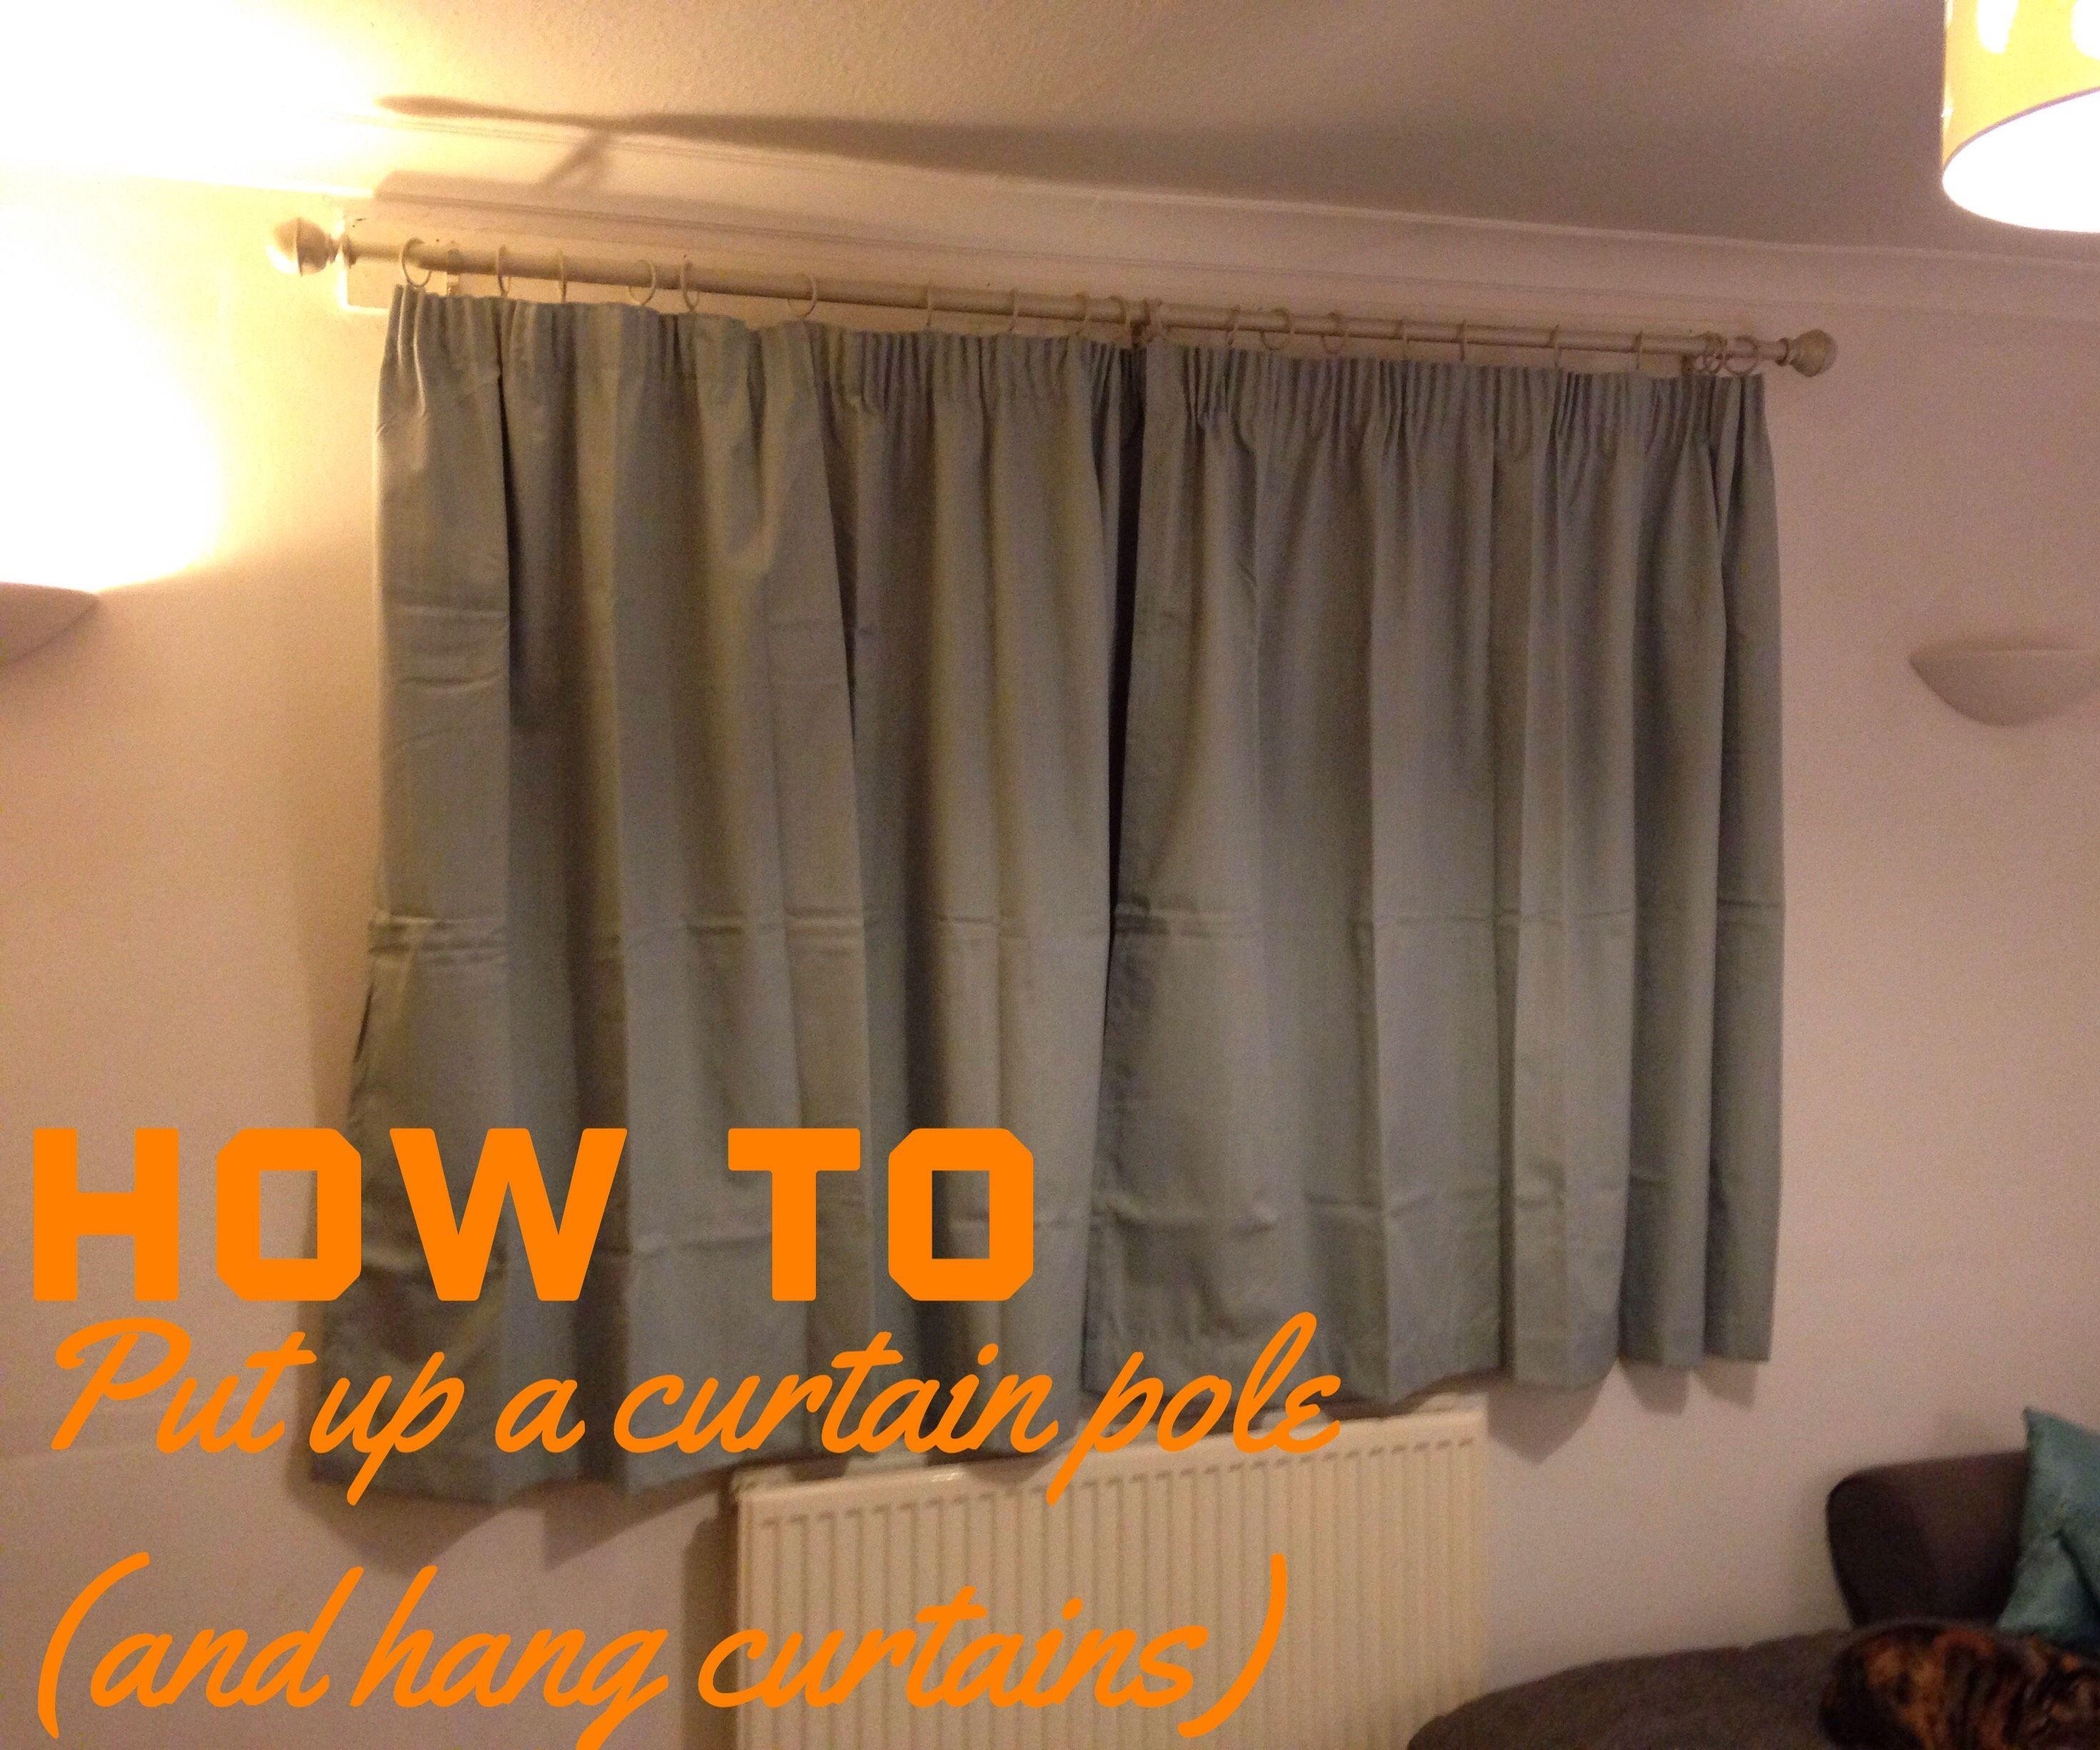 how to put up a curtain pole 9 steps